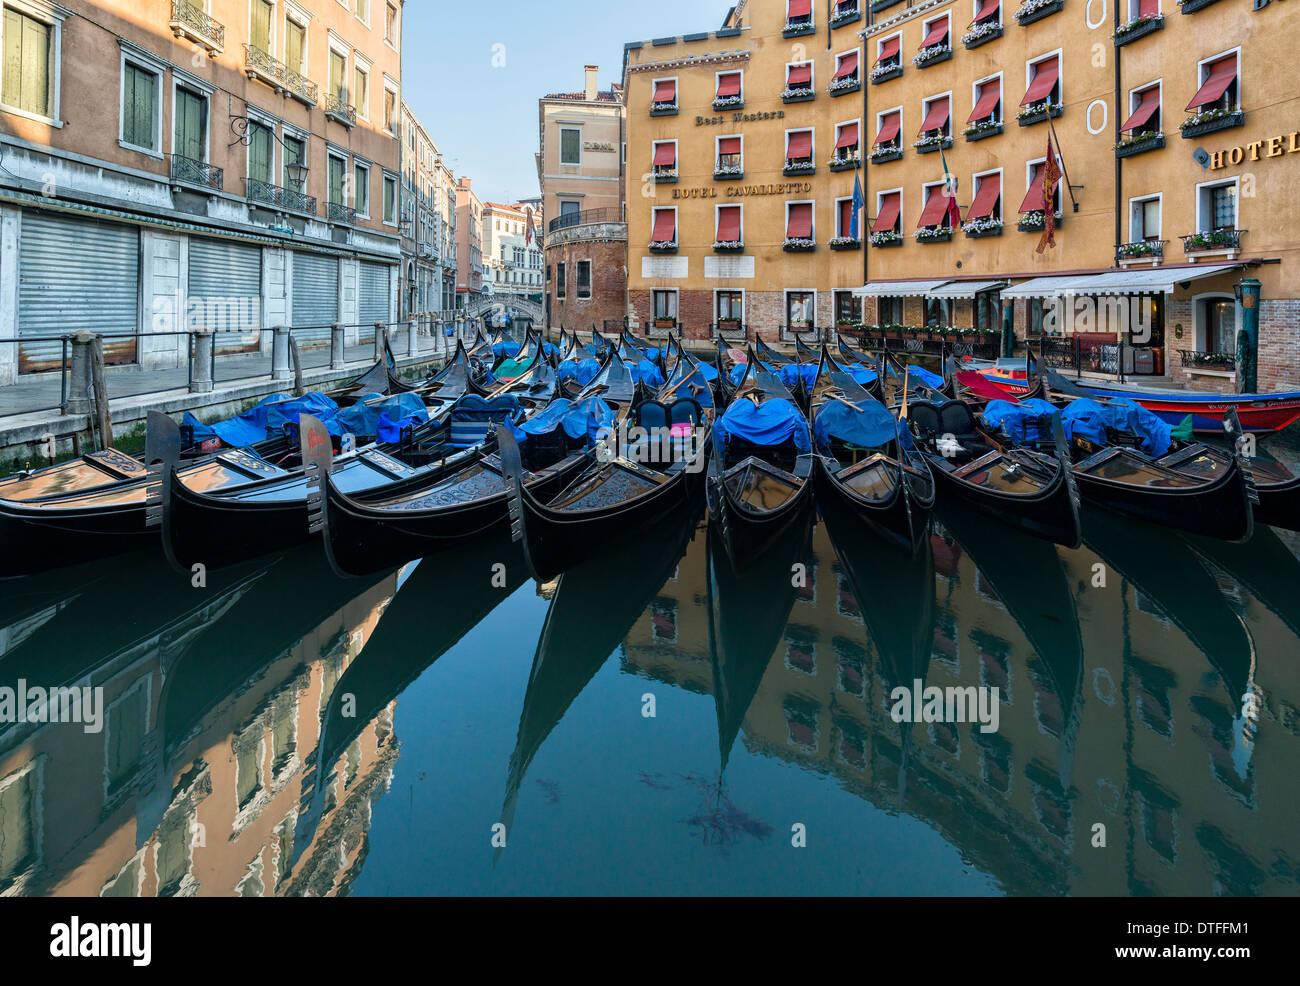 Hotel Cavalletto and Gondola moorings in Bacino Orseolo Venice. - Stock Image